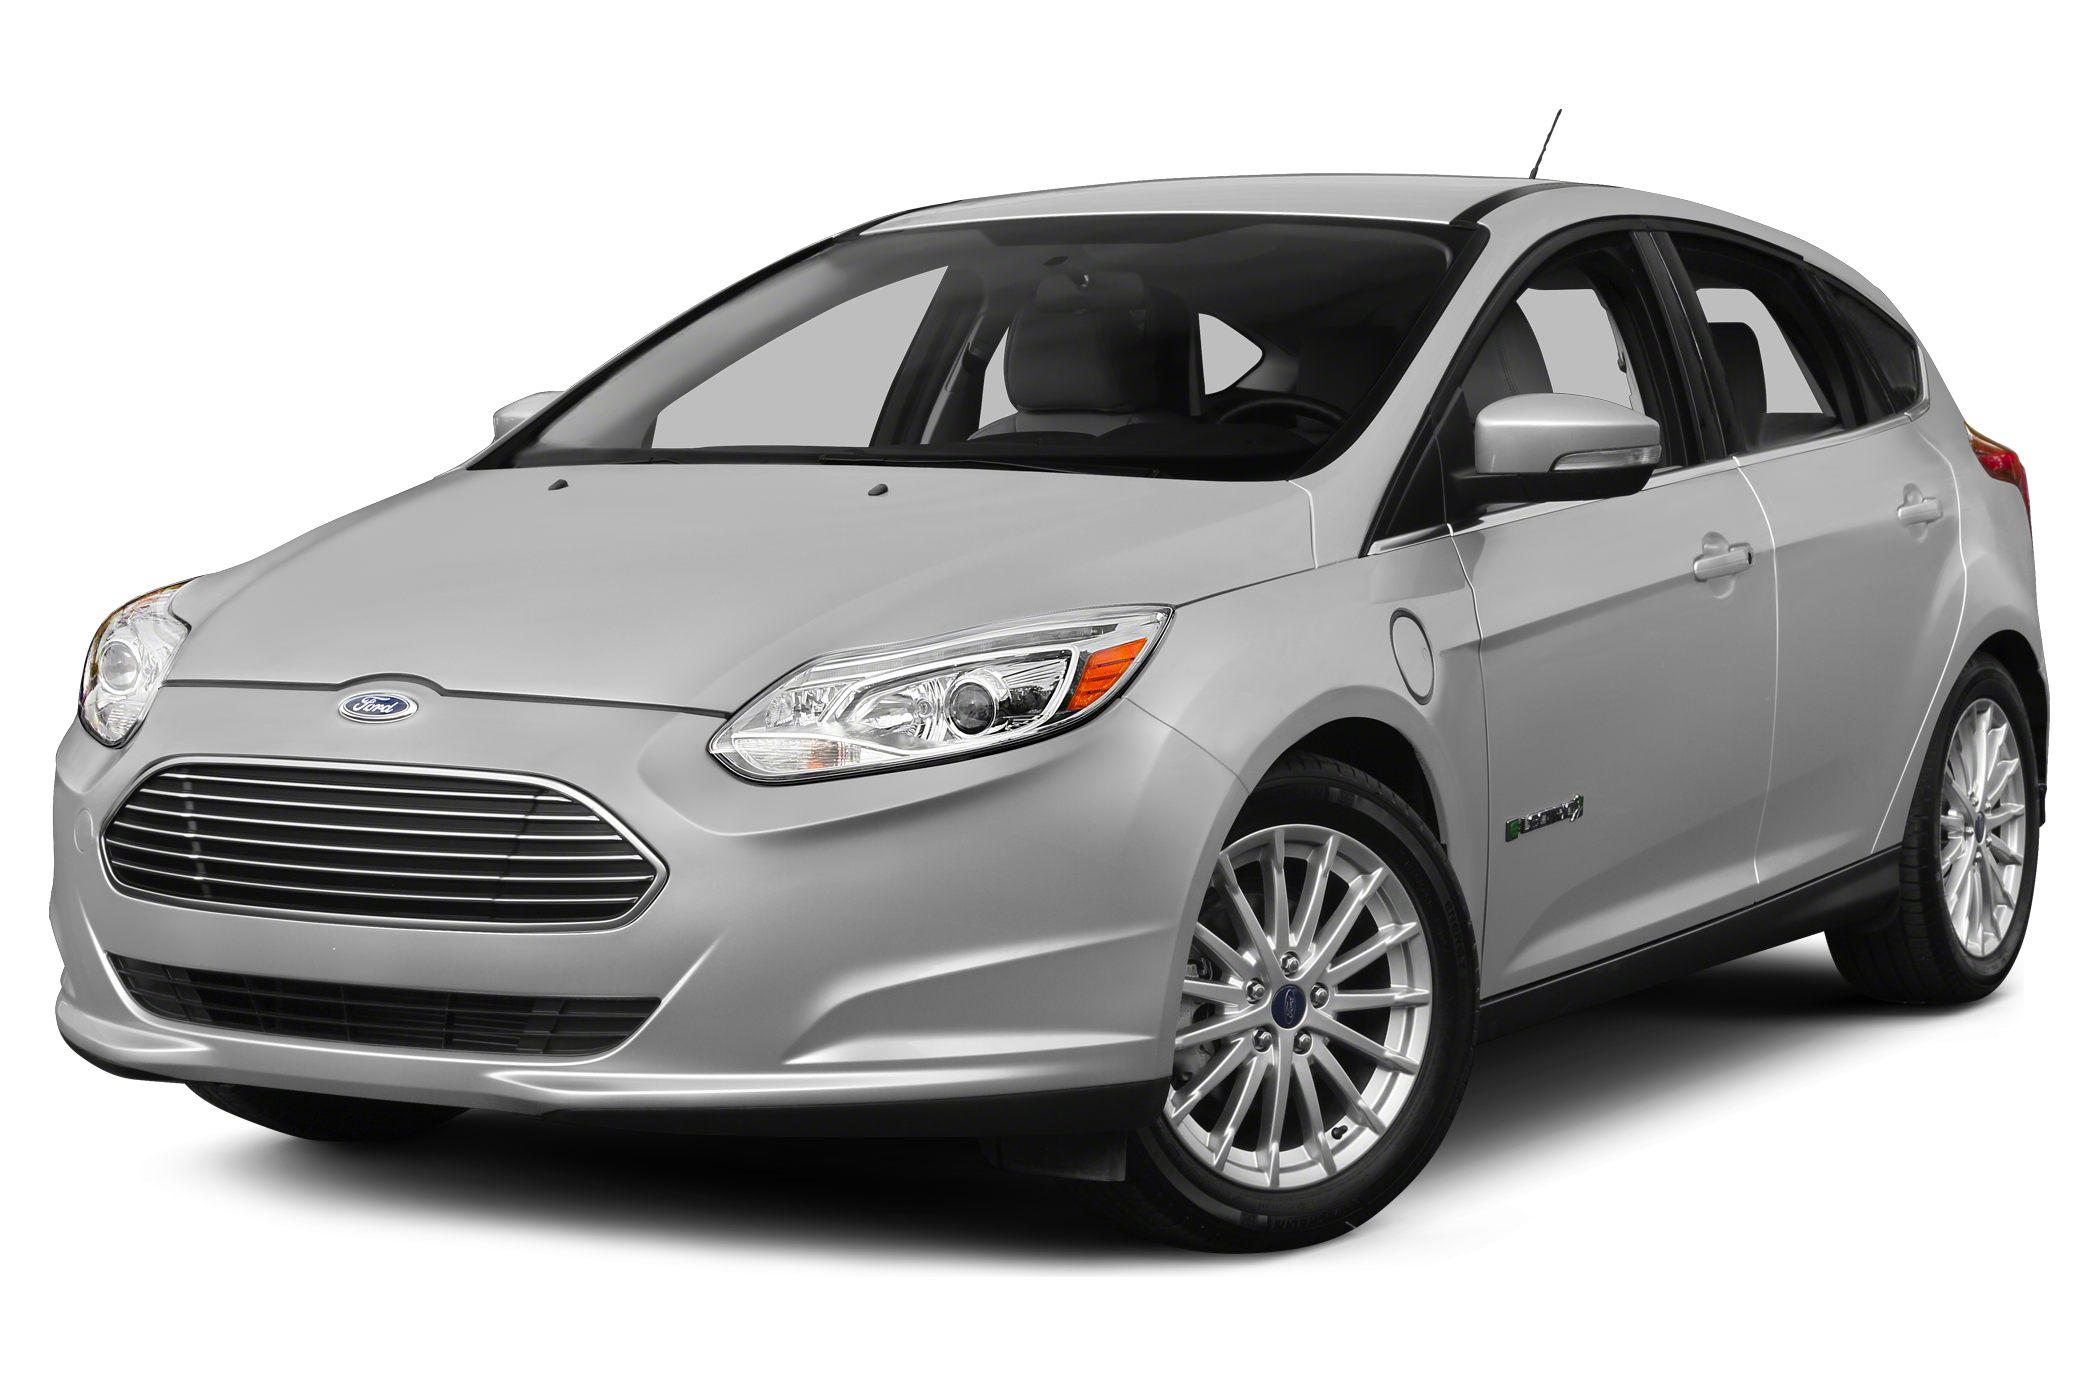 2014 Ford Focus Electric Base 99110 HighwayCity MPG Miles 24921Stock EL378144 VIN 1FADP3R44